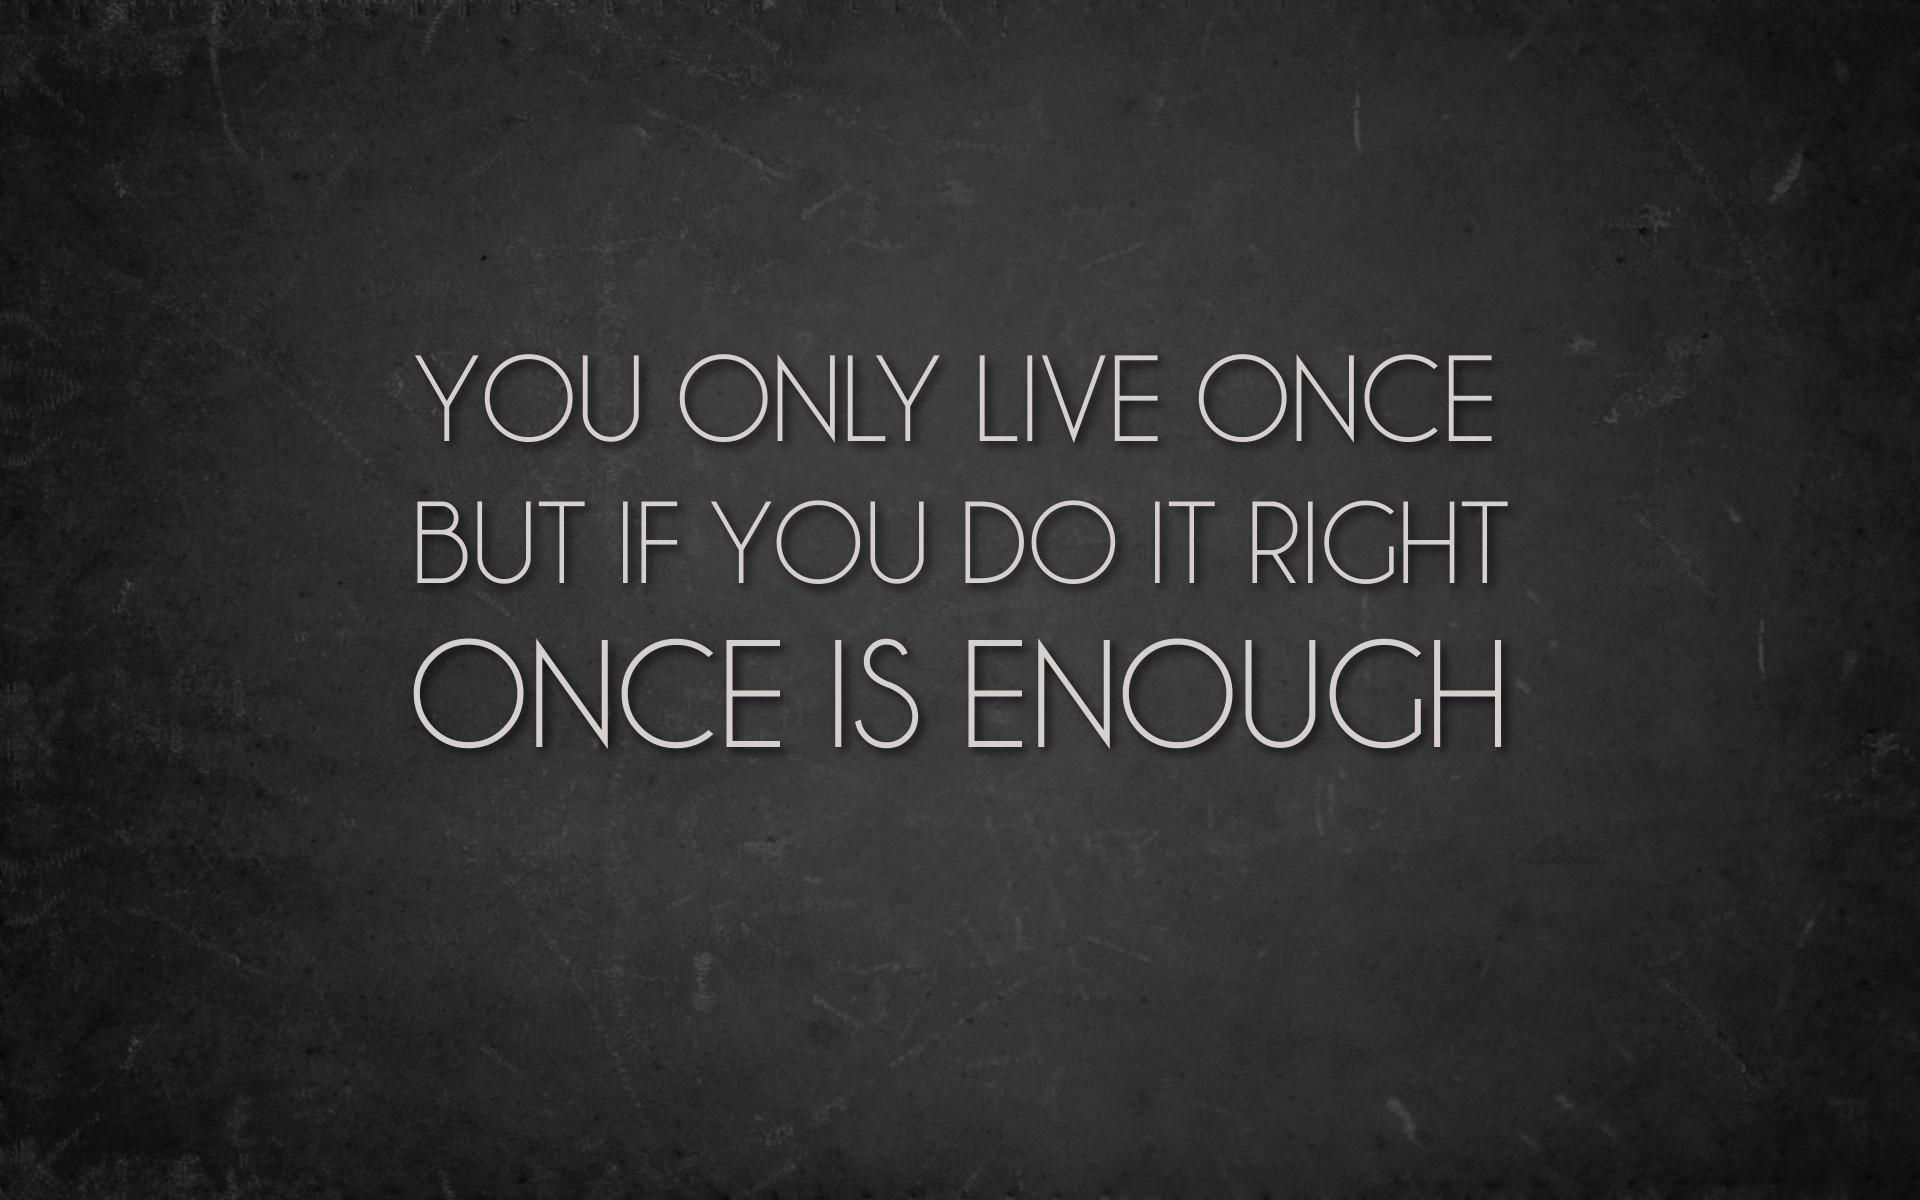 Inspirational Motivational Quotes Desktop Wallpaper QuotesGram 1920x1200